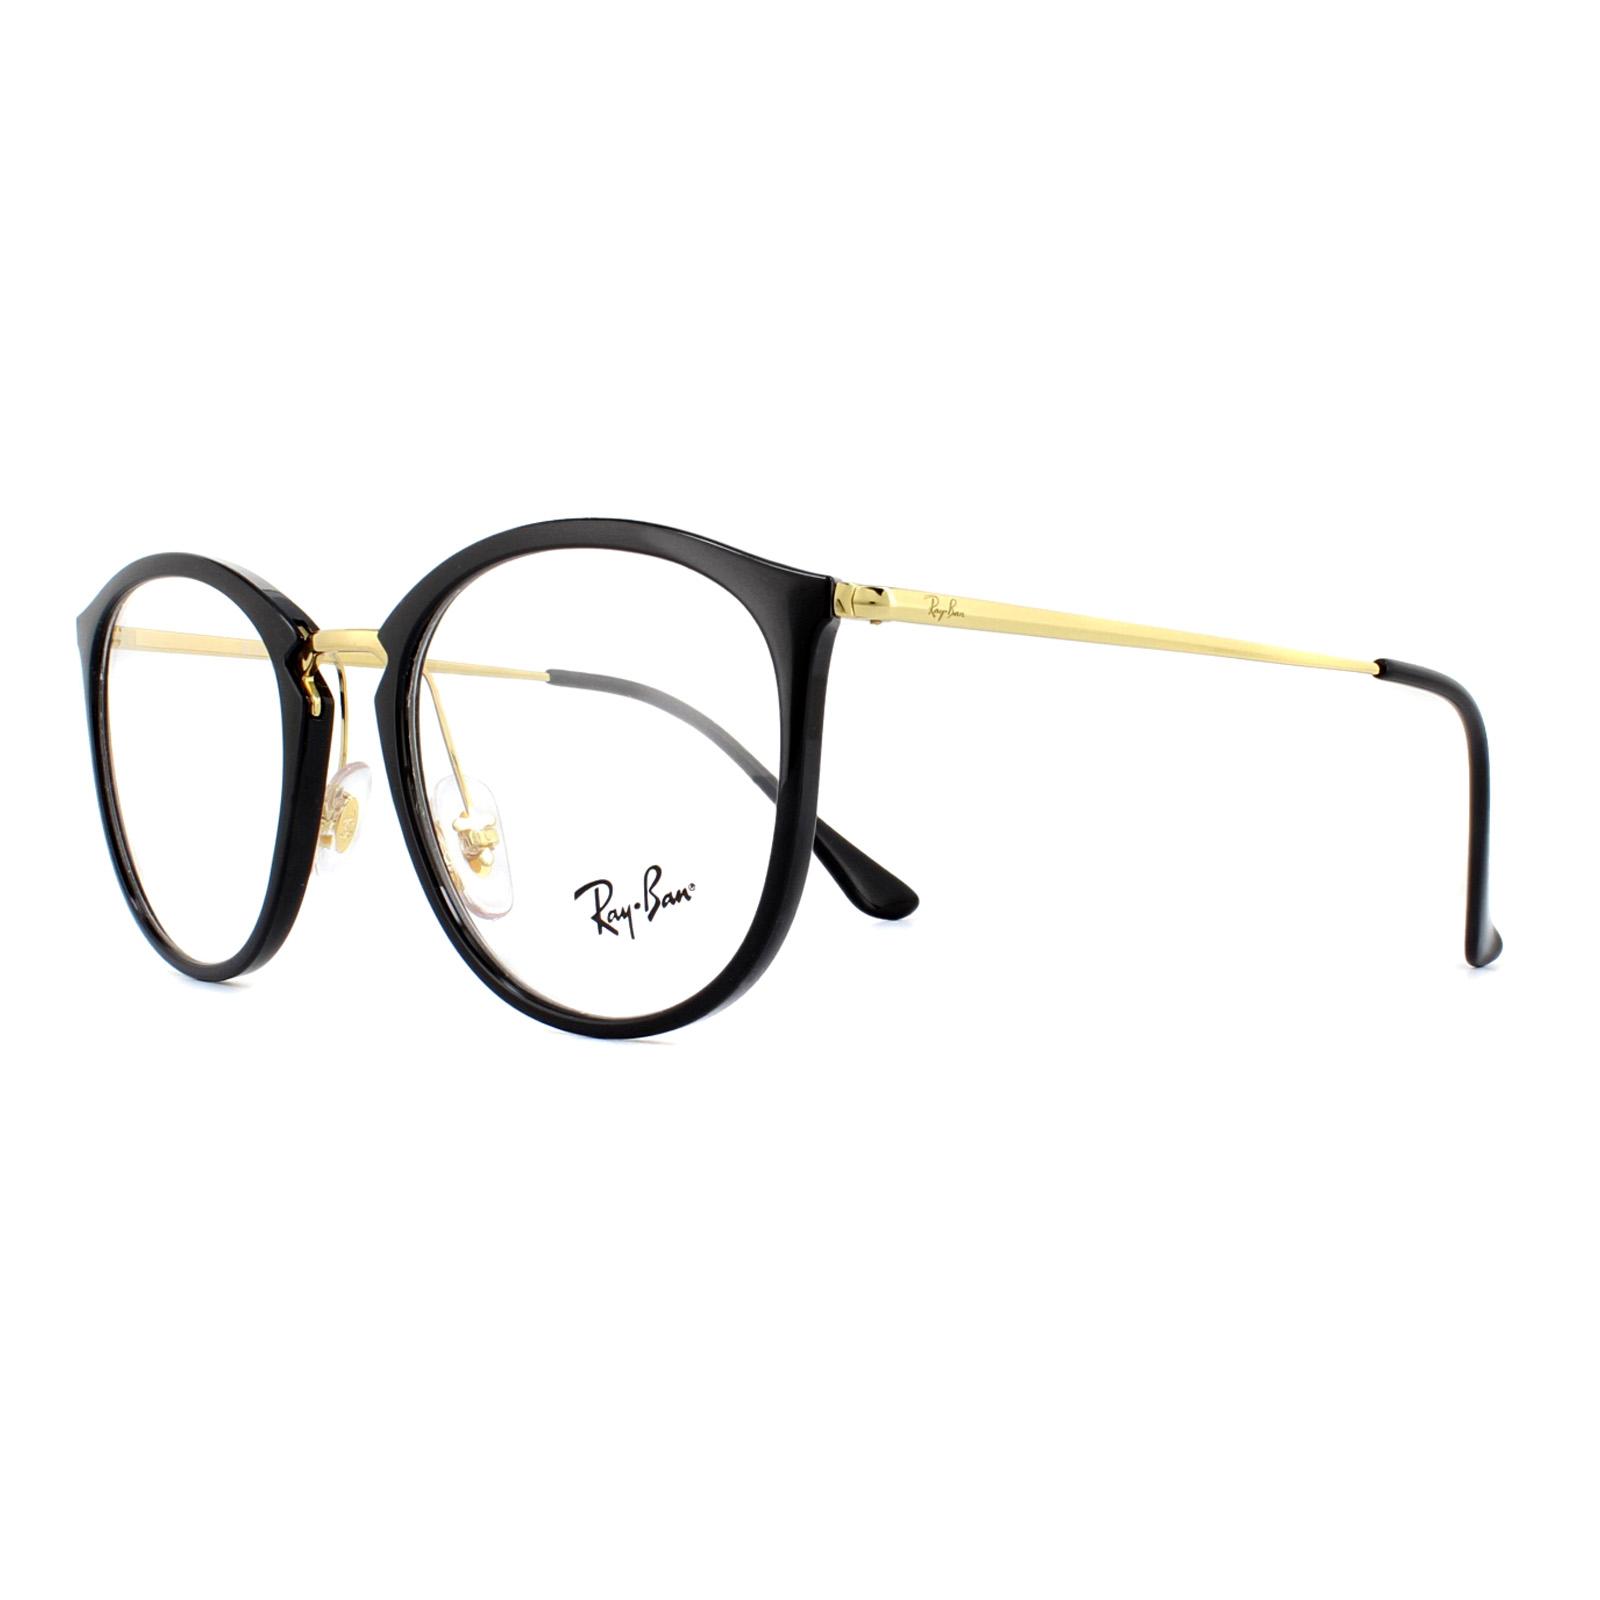 6662836620 Ray-Ban Glasses Frames 7140 2000 Shiny Black 51mm 8053672822564